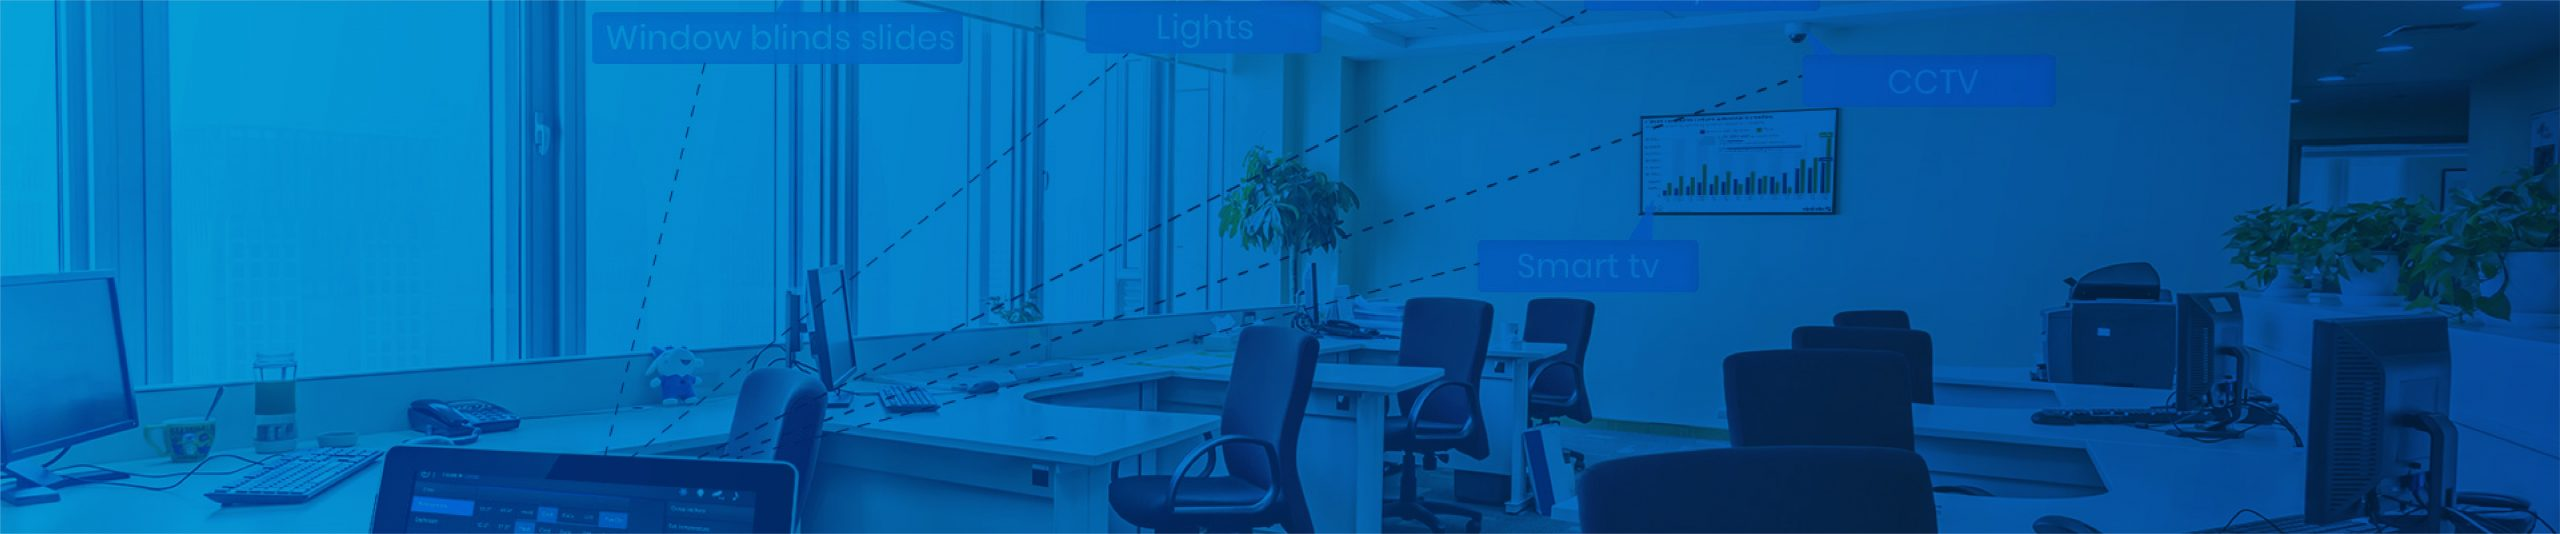 Smart Office Suite Header image